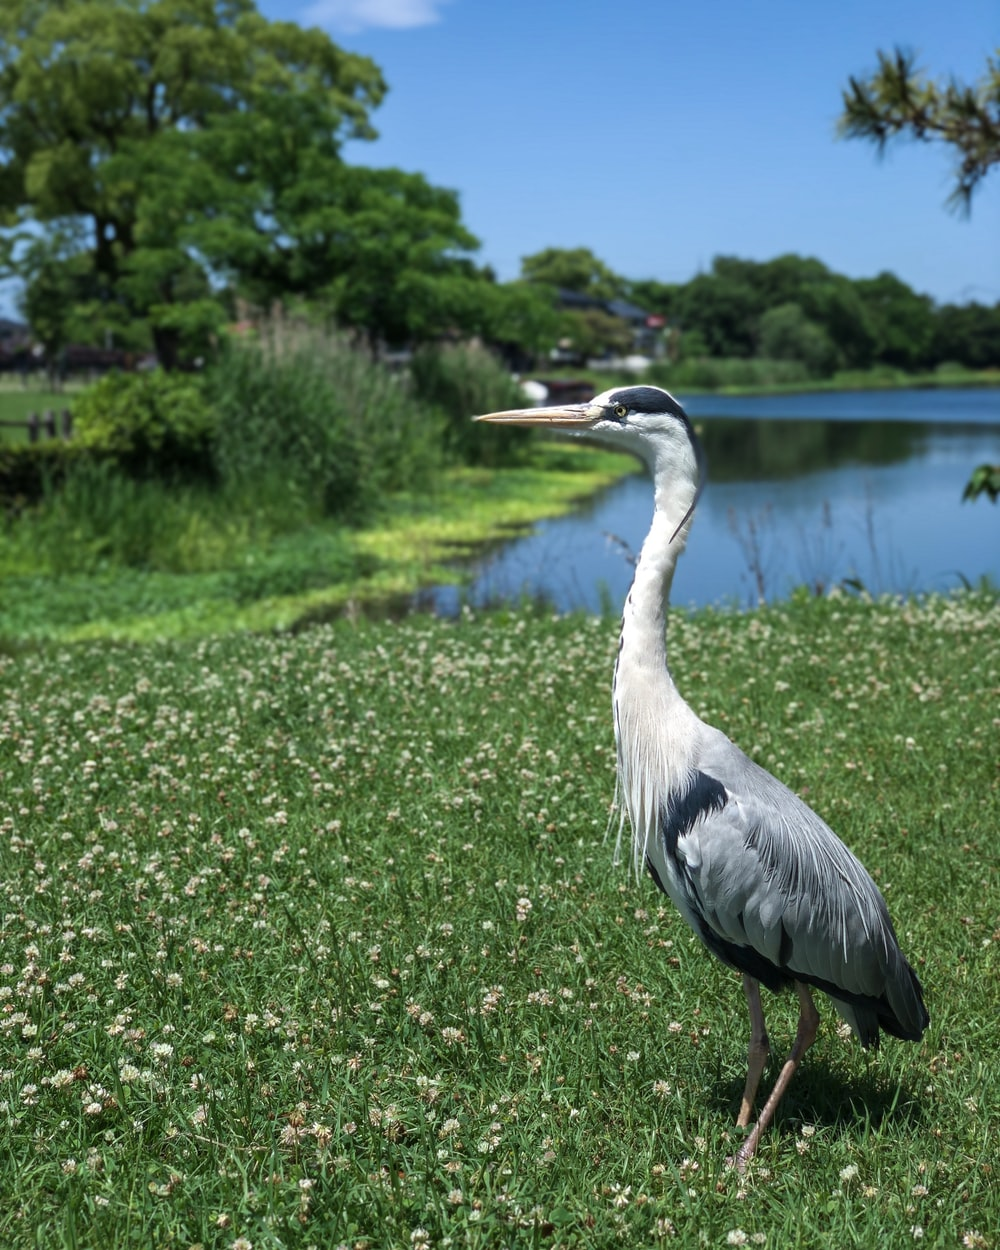 white and black bird beside lake